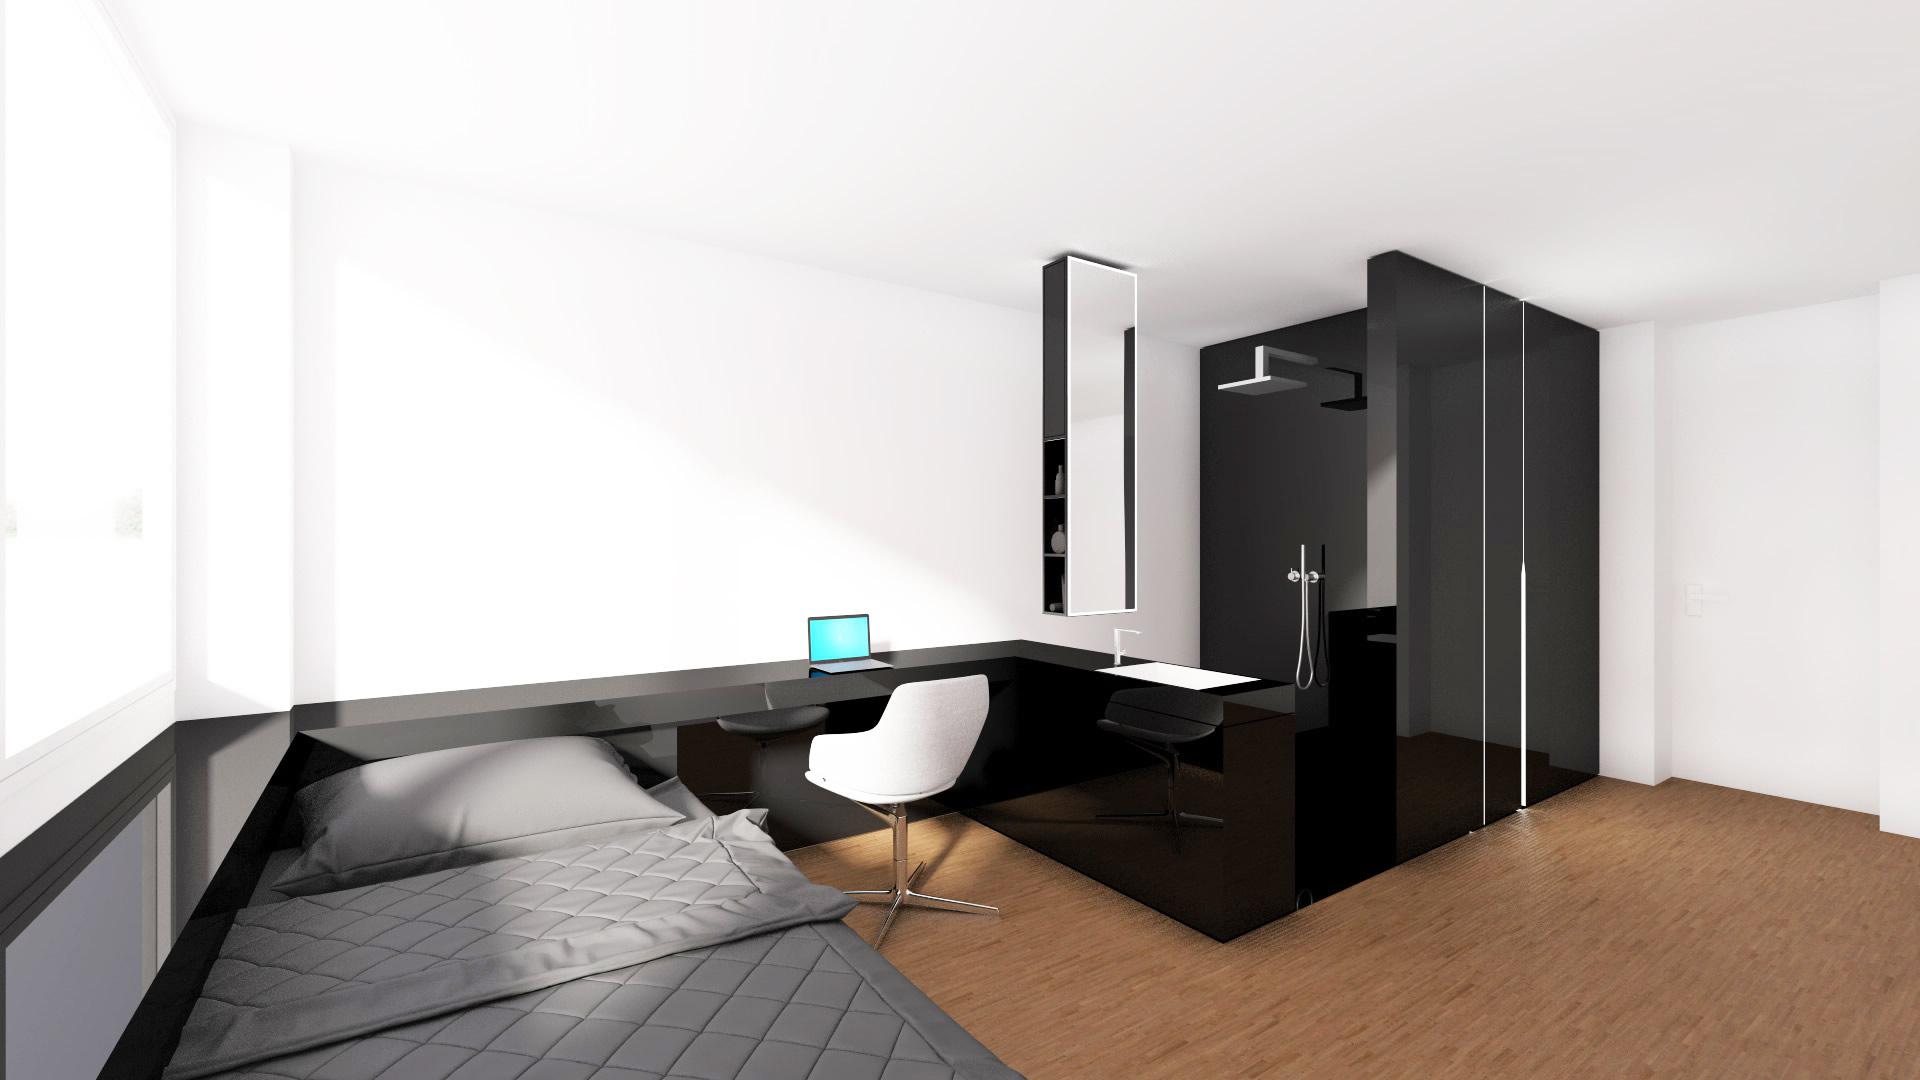 whocares_design_hotel_material-5